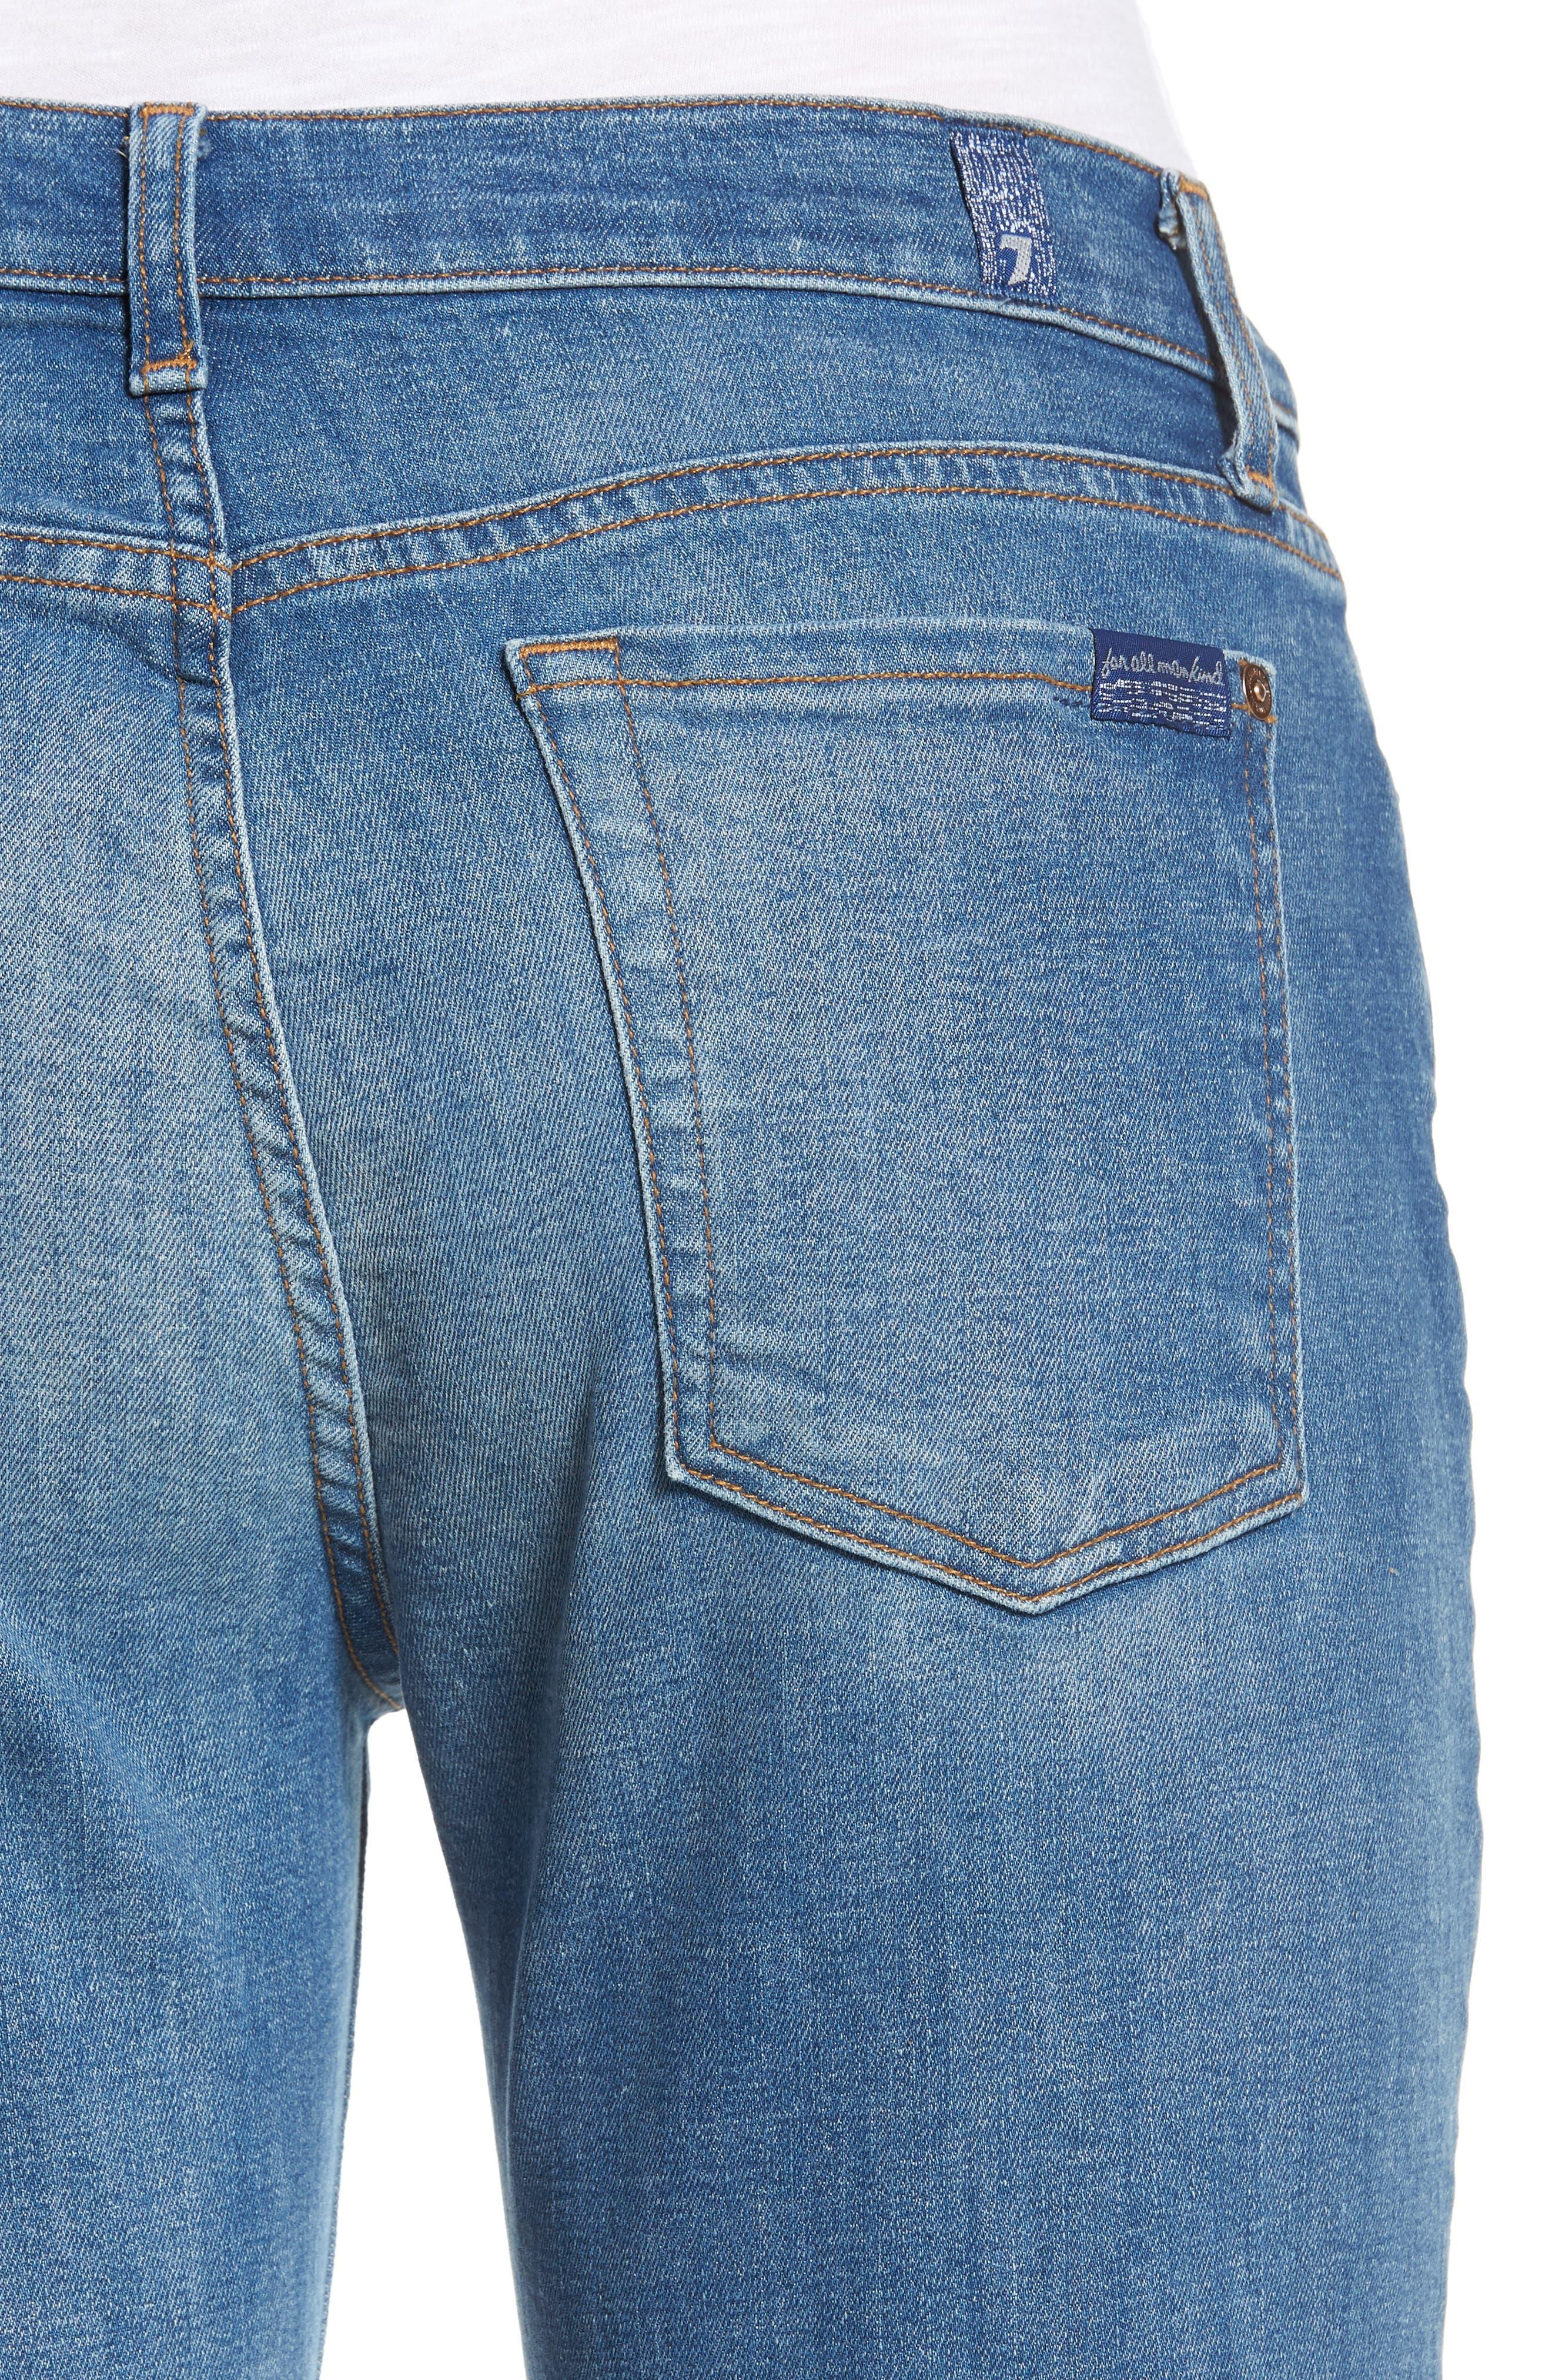 Josefina Ripped Boyfriend Jeans,                             Alternate thumbnail 4, color,                             400